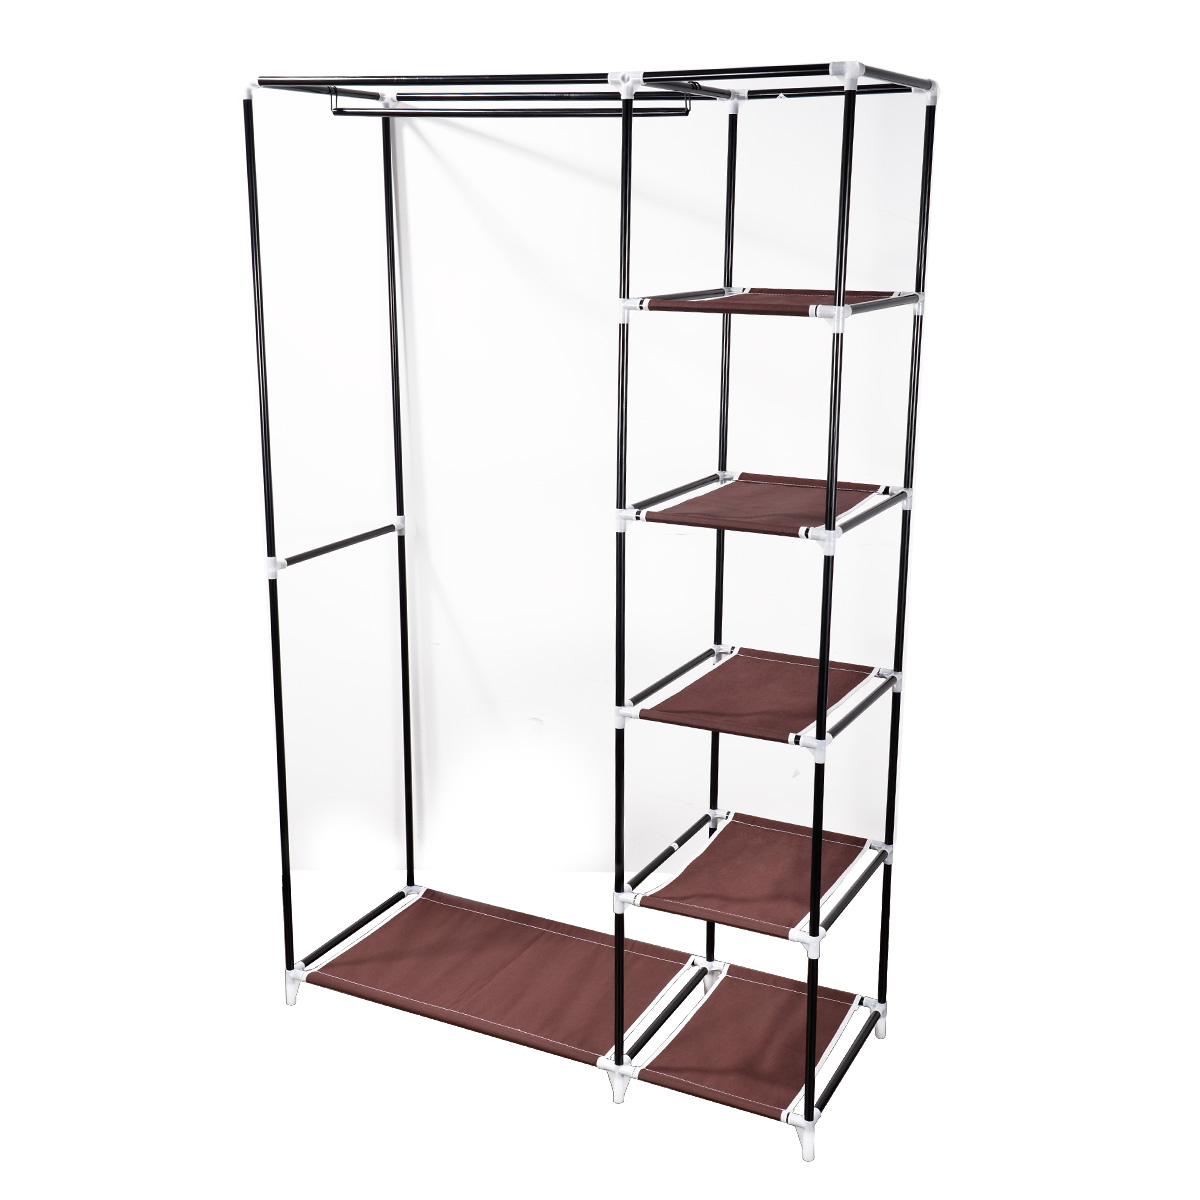 kleiderschrank faltschrank stoffschrank campingschrank. Black Bedroom Furniture Sets. Home Design Ideas